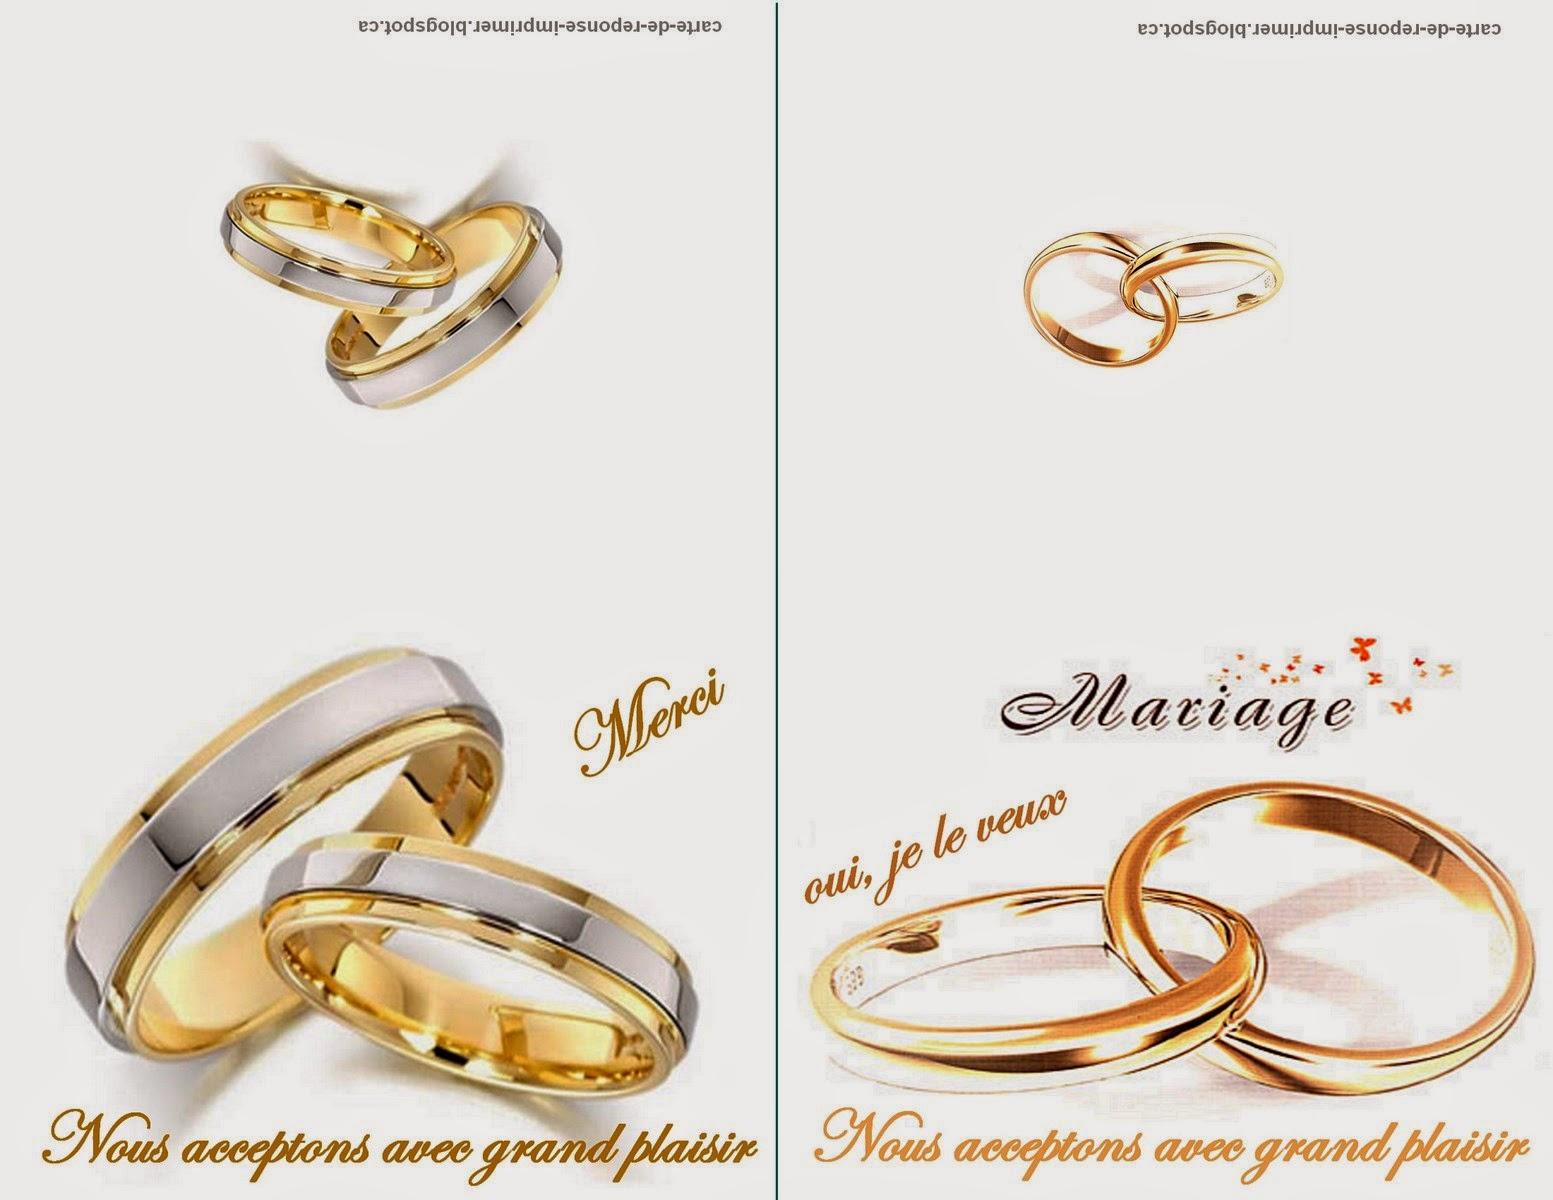 carte mariage gratuite imprimer invitation mariage carte - Carte Flicitation Mariage Imprimer Gratuite